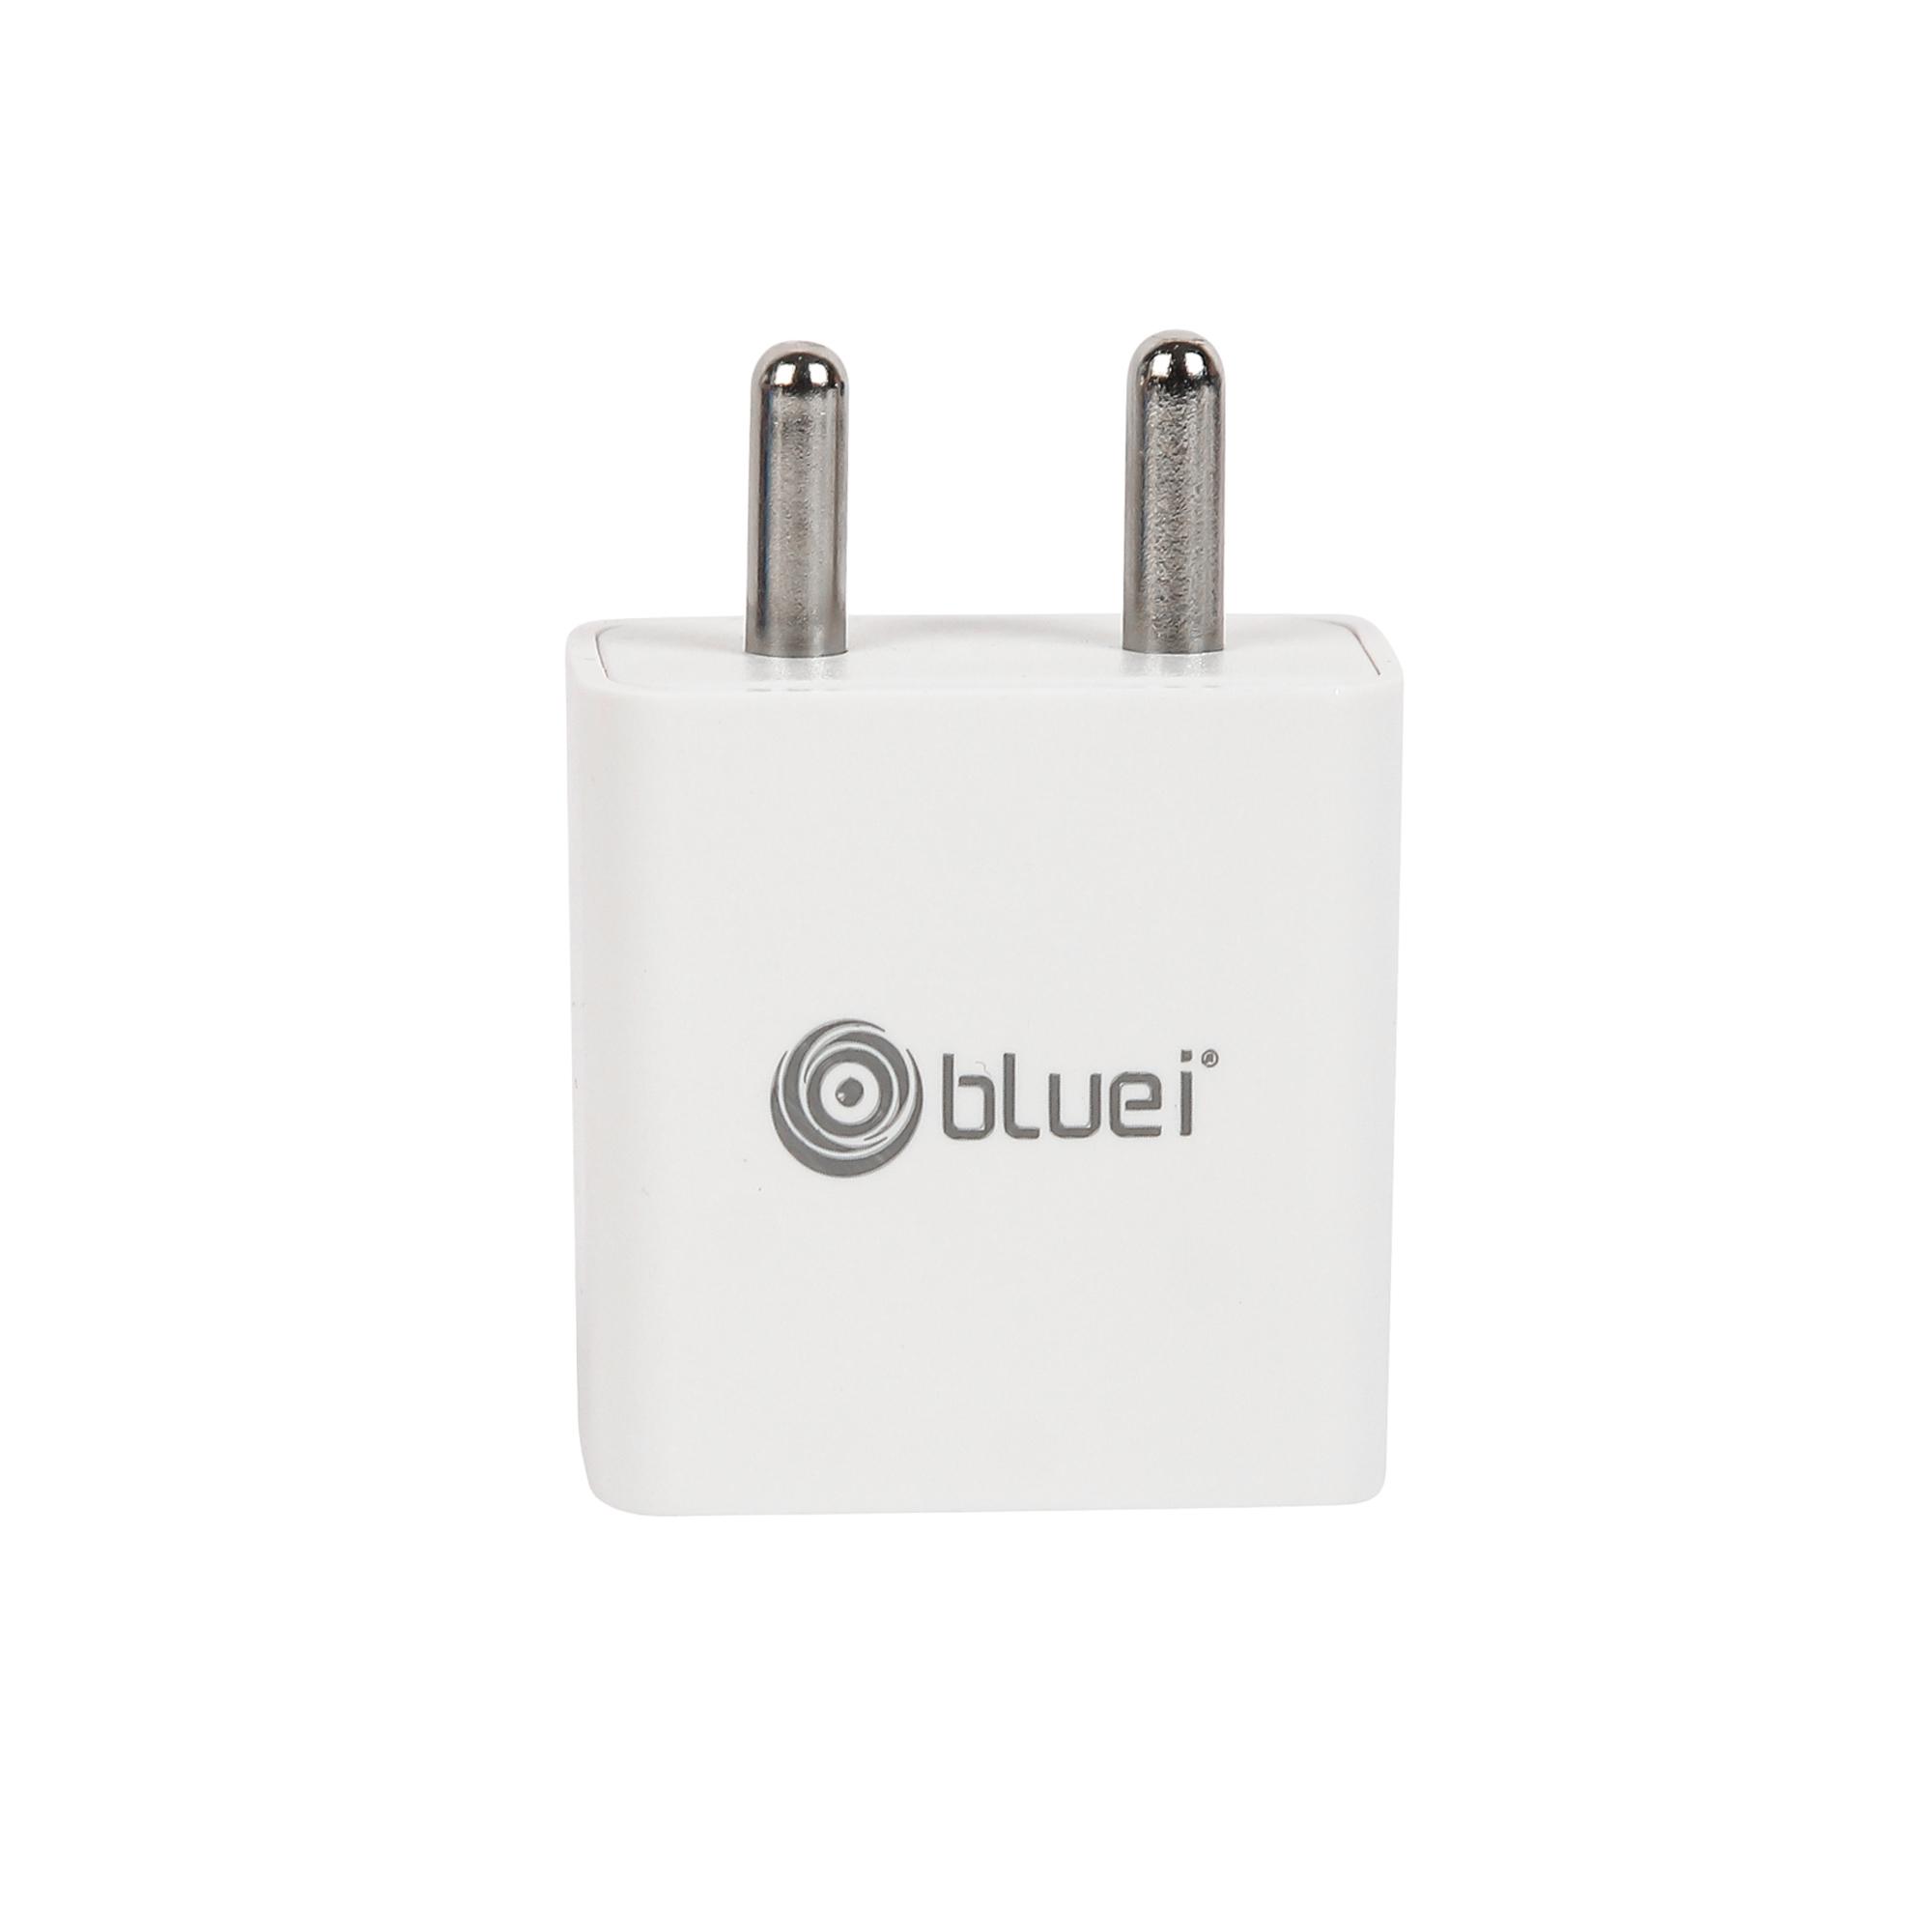 Bluei Ta-01 1.8a Single Usb Travel Charger